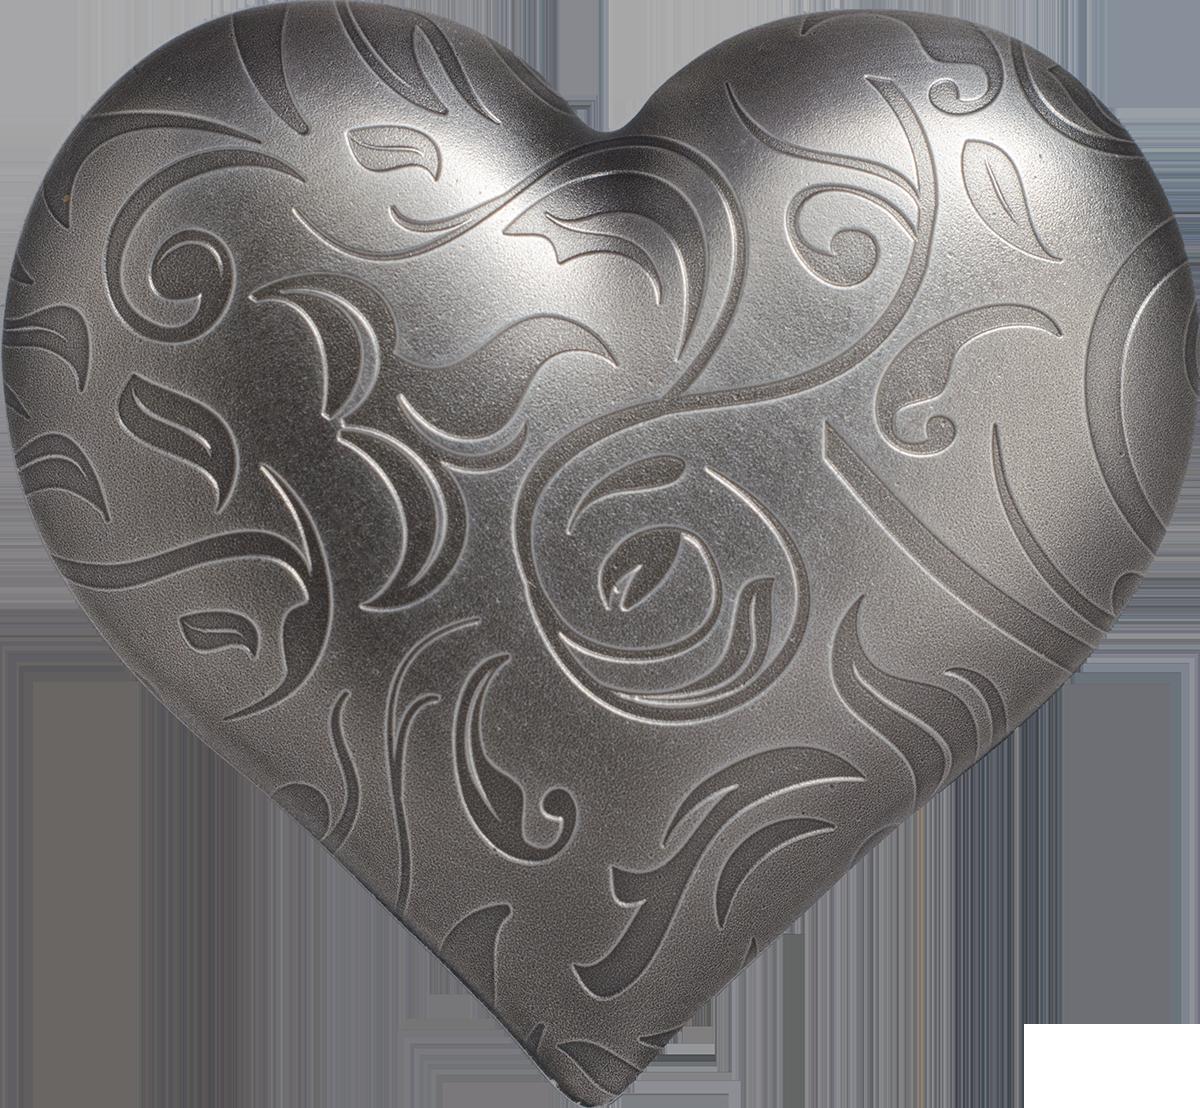 Palau - 2018 - 5 Dollars - Silver Heart